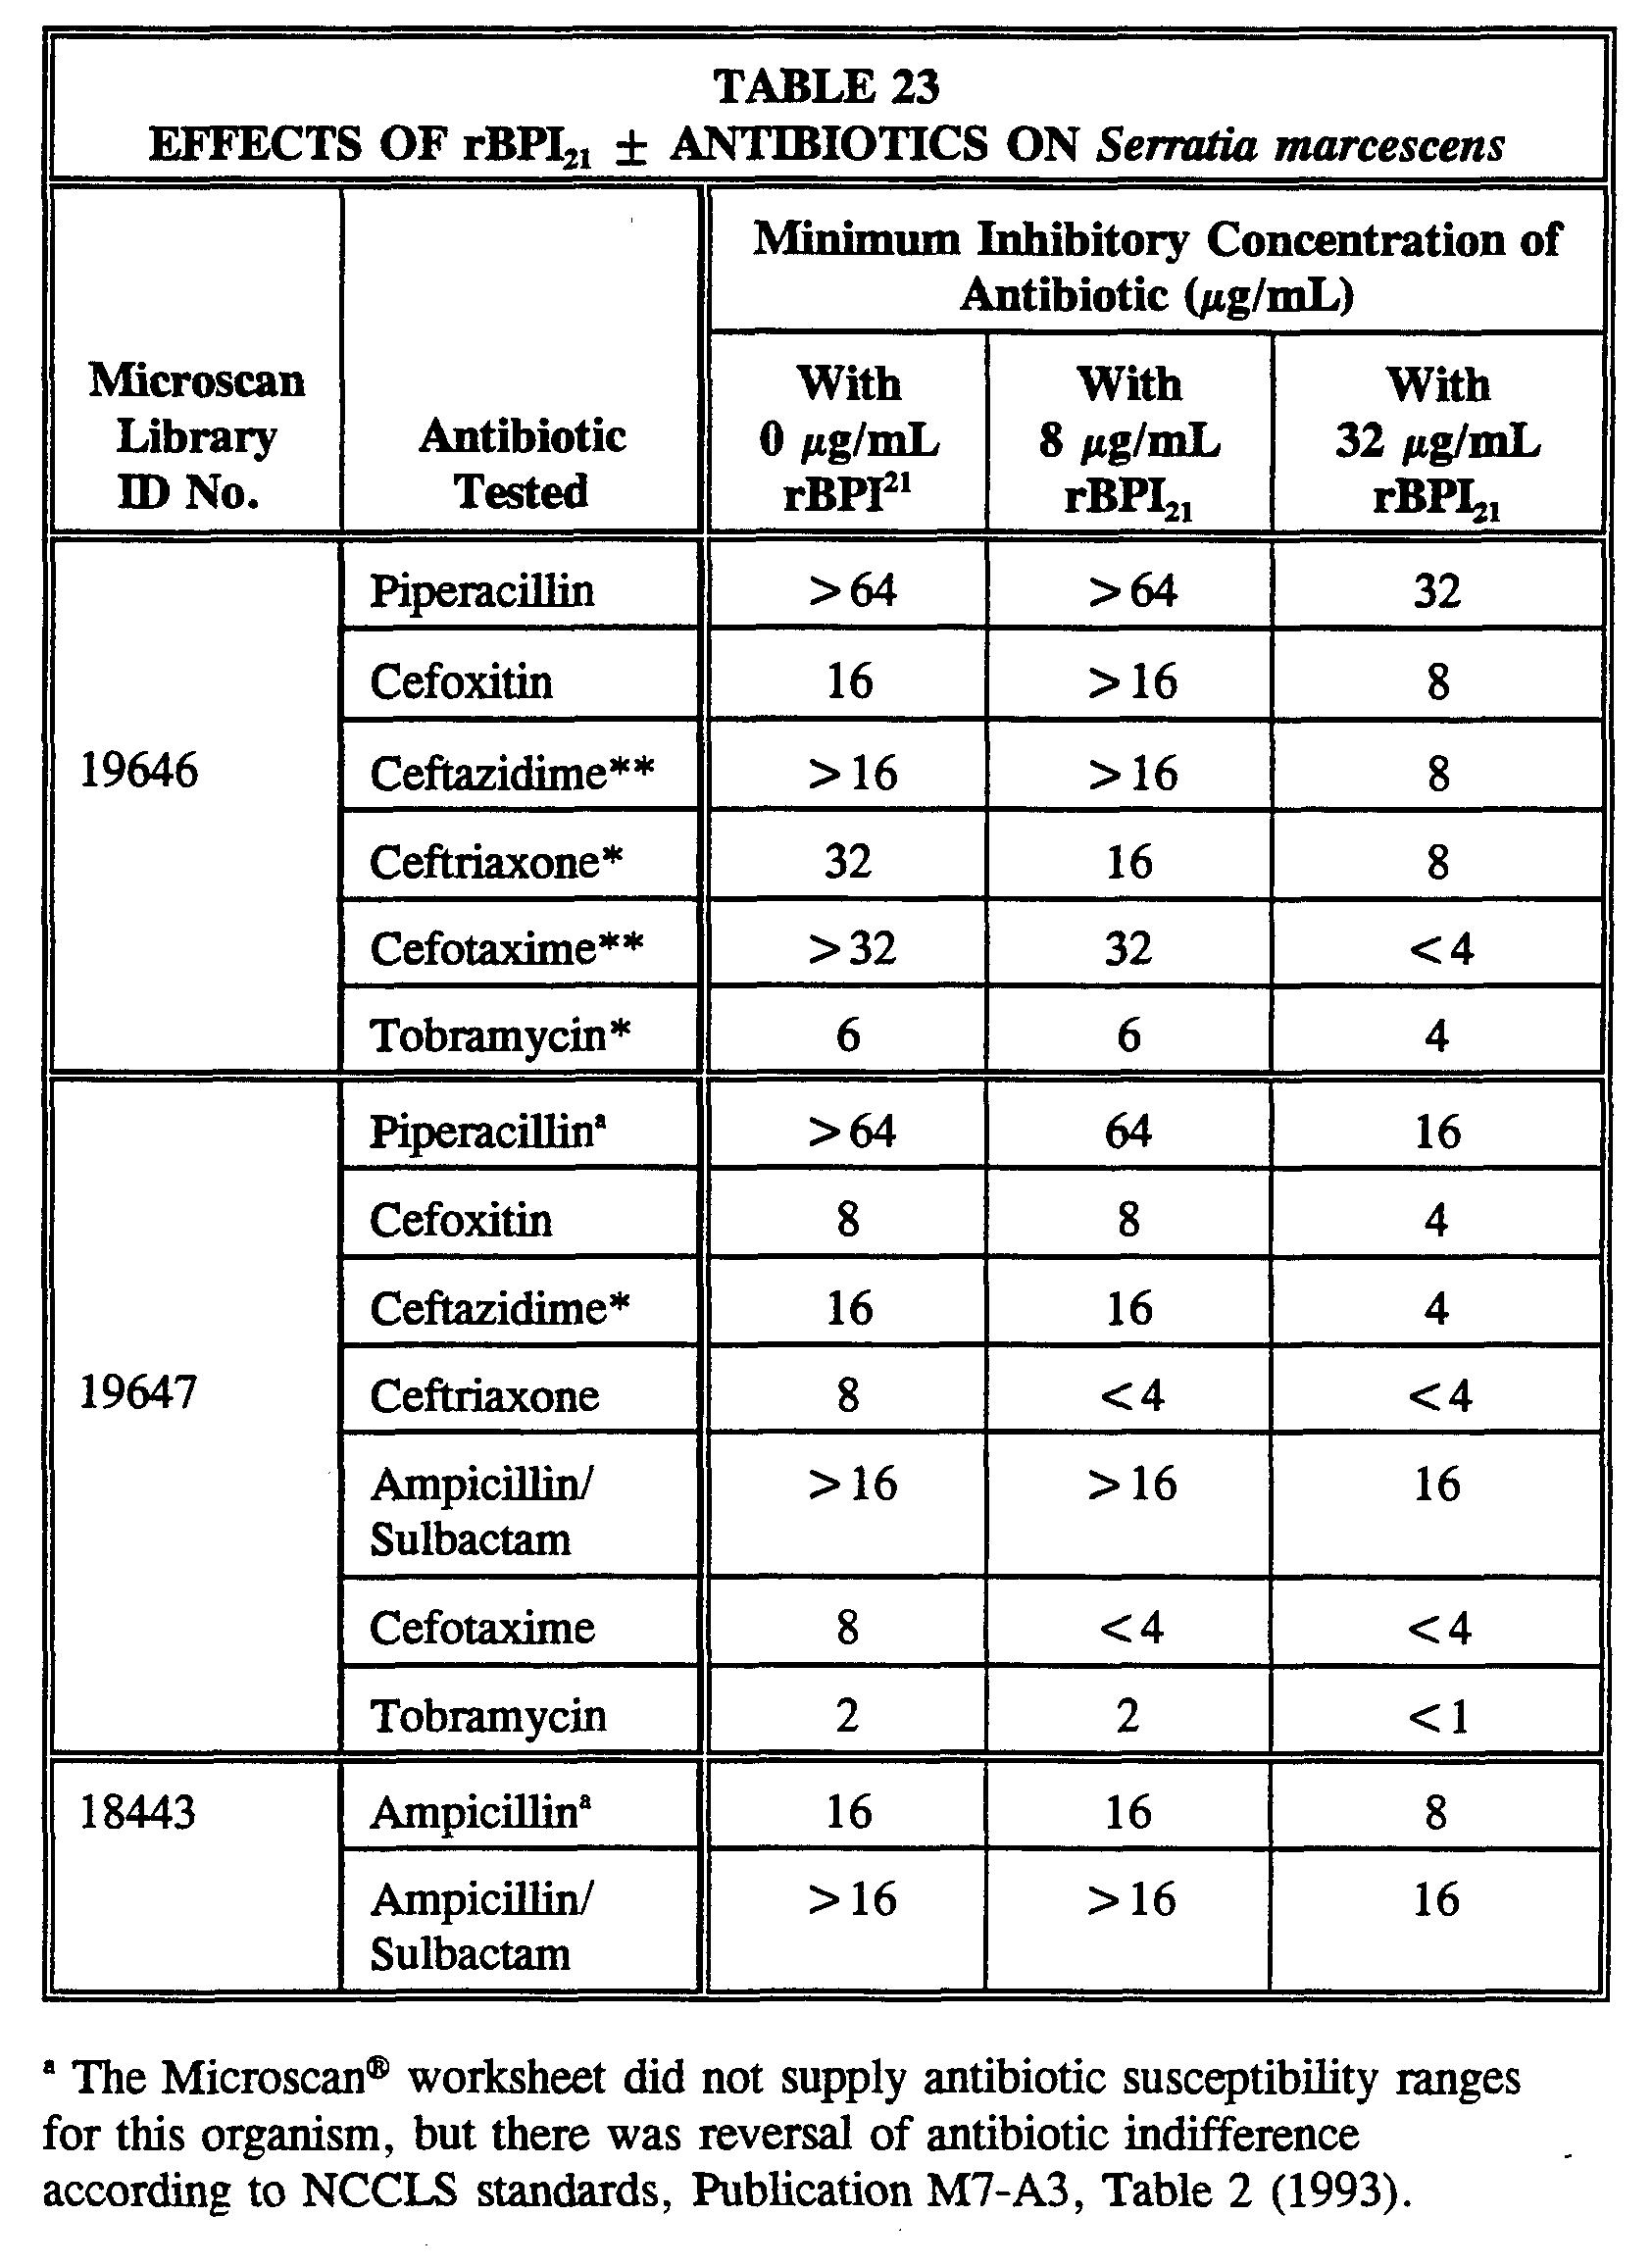 proteus vulgaris antibiotic sensitivity assay essay How can we fix up a more formal assay of  (pseudomonas, e coli, klebsiella, h influenzae, serratia, proteus  in reported injury of sensitivity to.